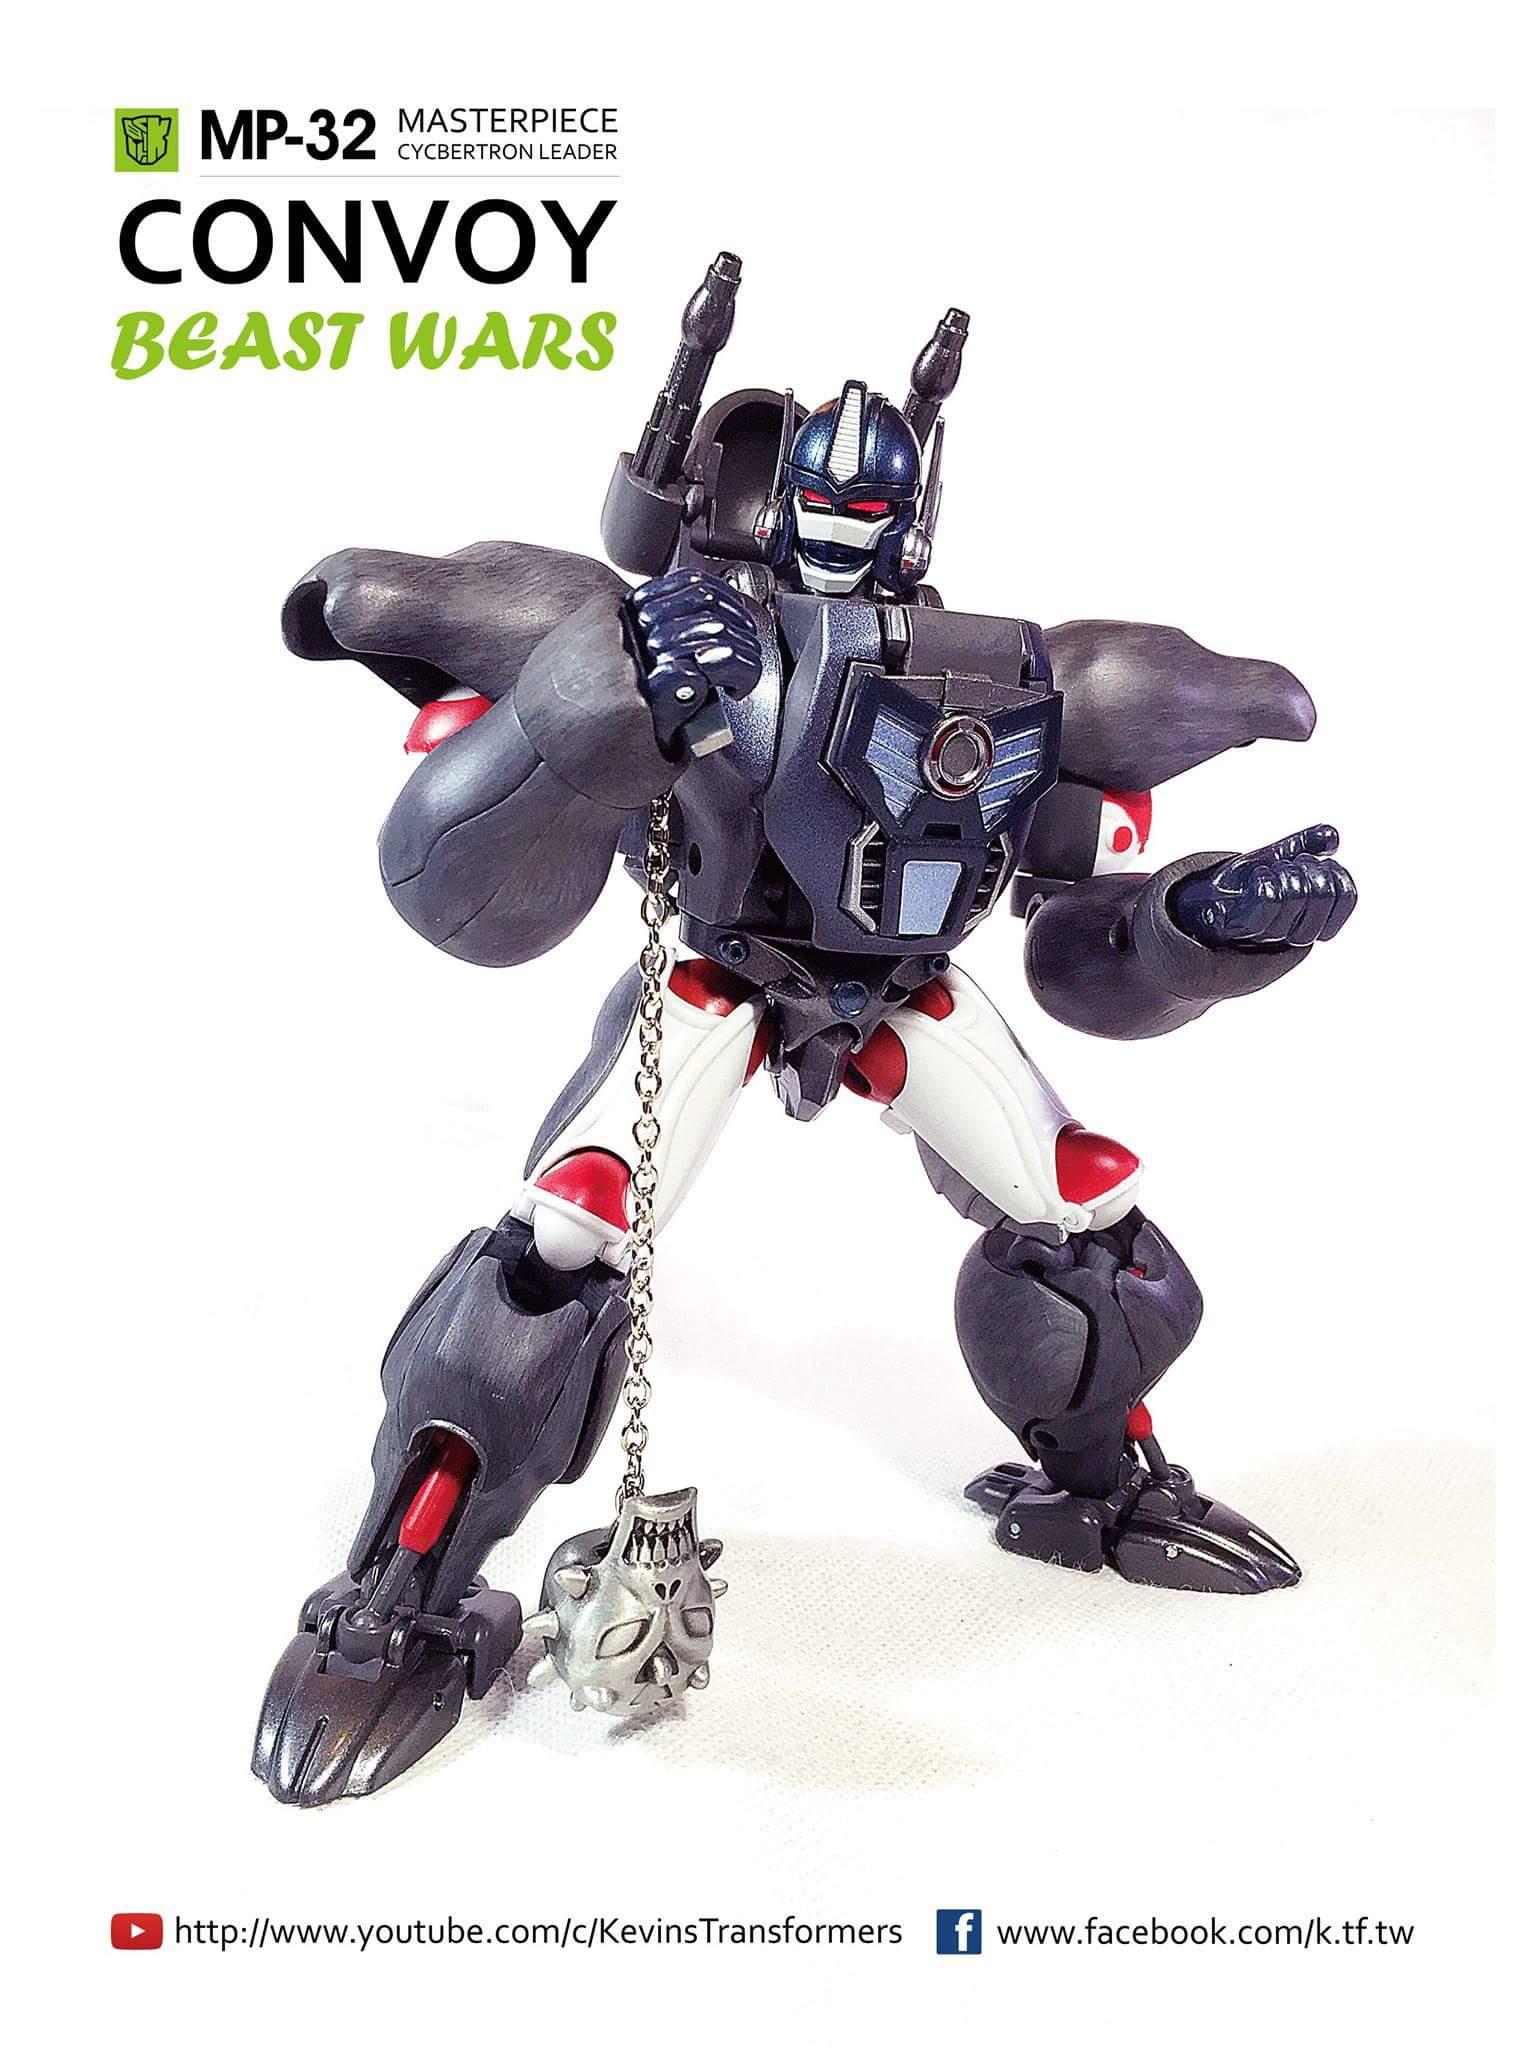 [Masterpiece] MP-32, MP-38 Optimus Primal et MP-38+ Burning Convoy (Beast Wars) - Page 3 HFsxjXEX